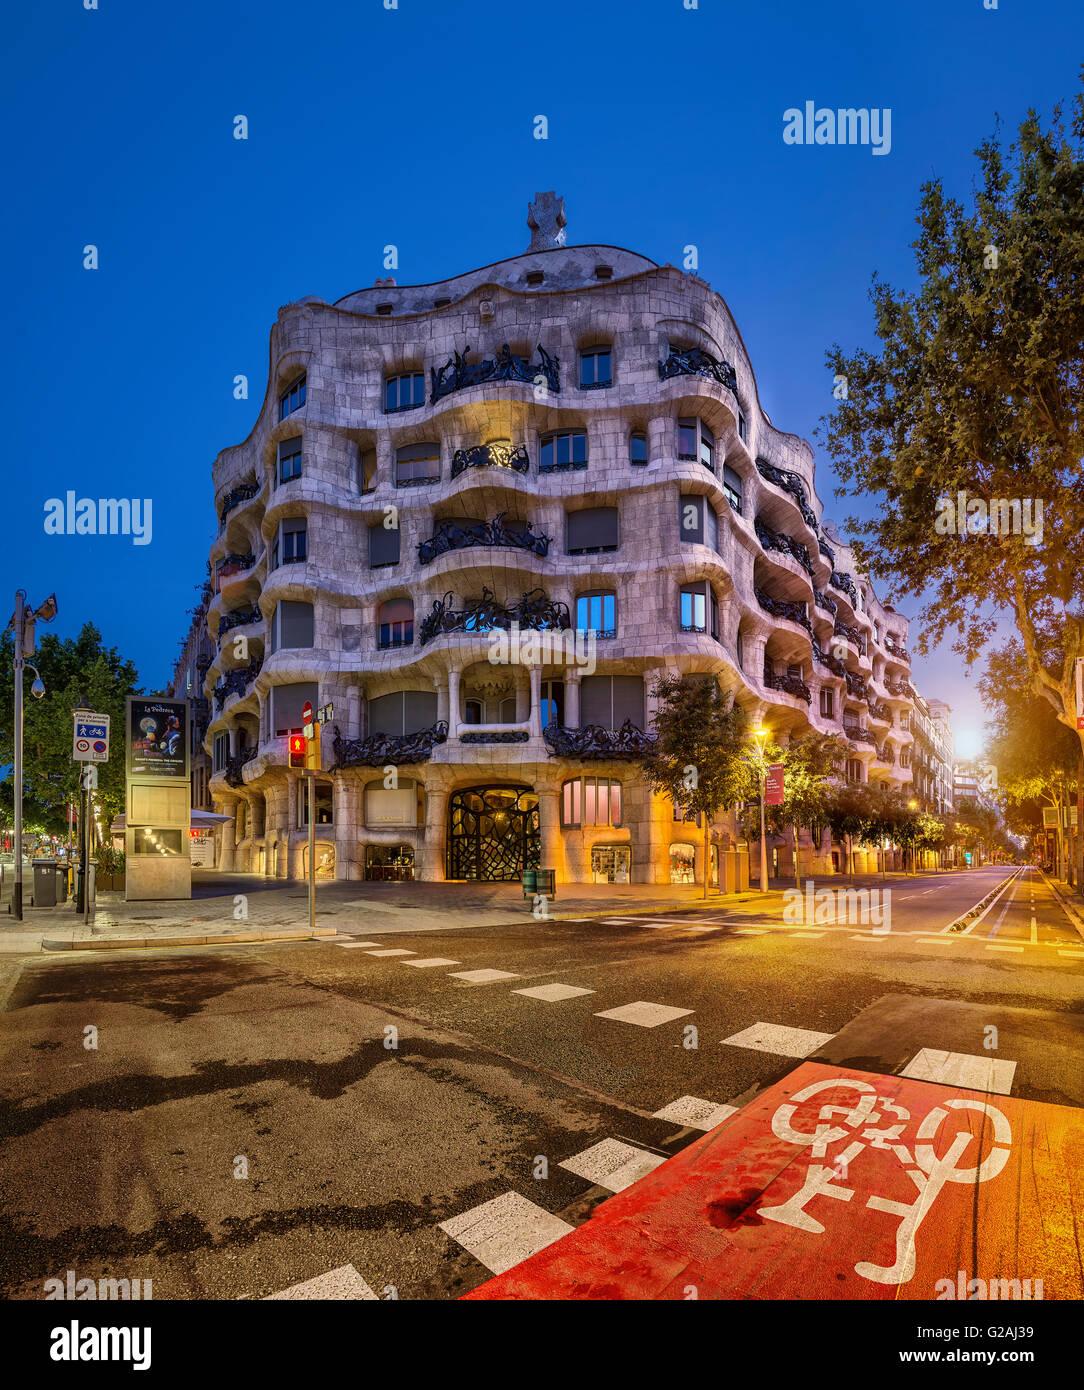 La Casa Milà, La Pedrera, Barcelona, Cataluña, España Imagen De Stock